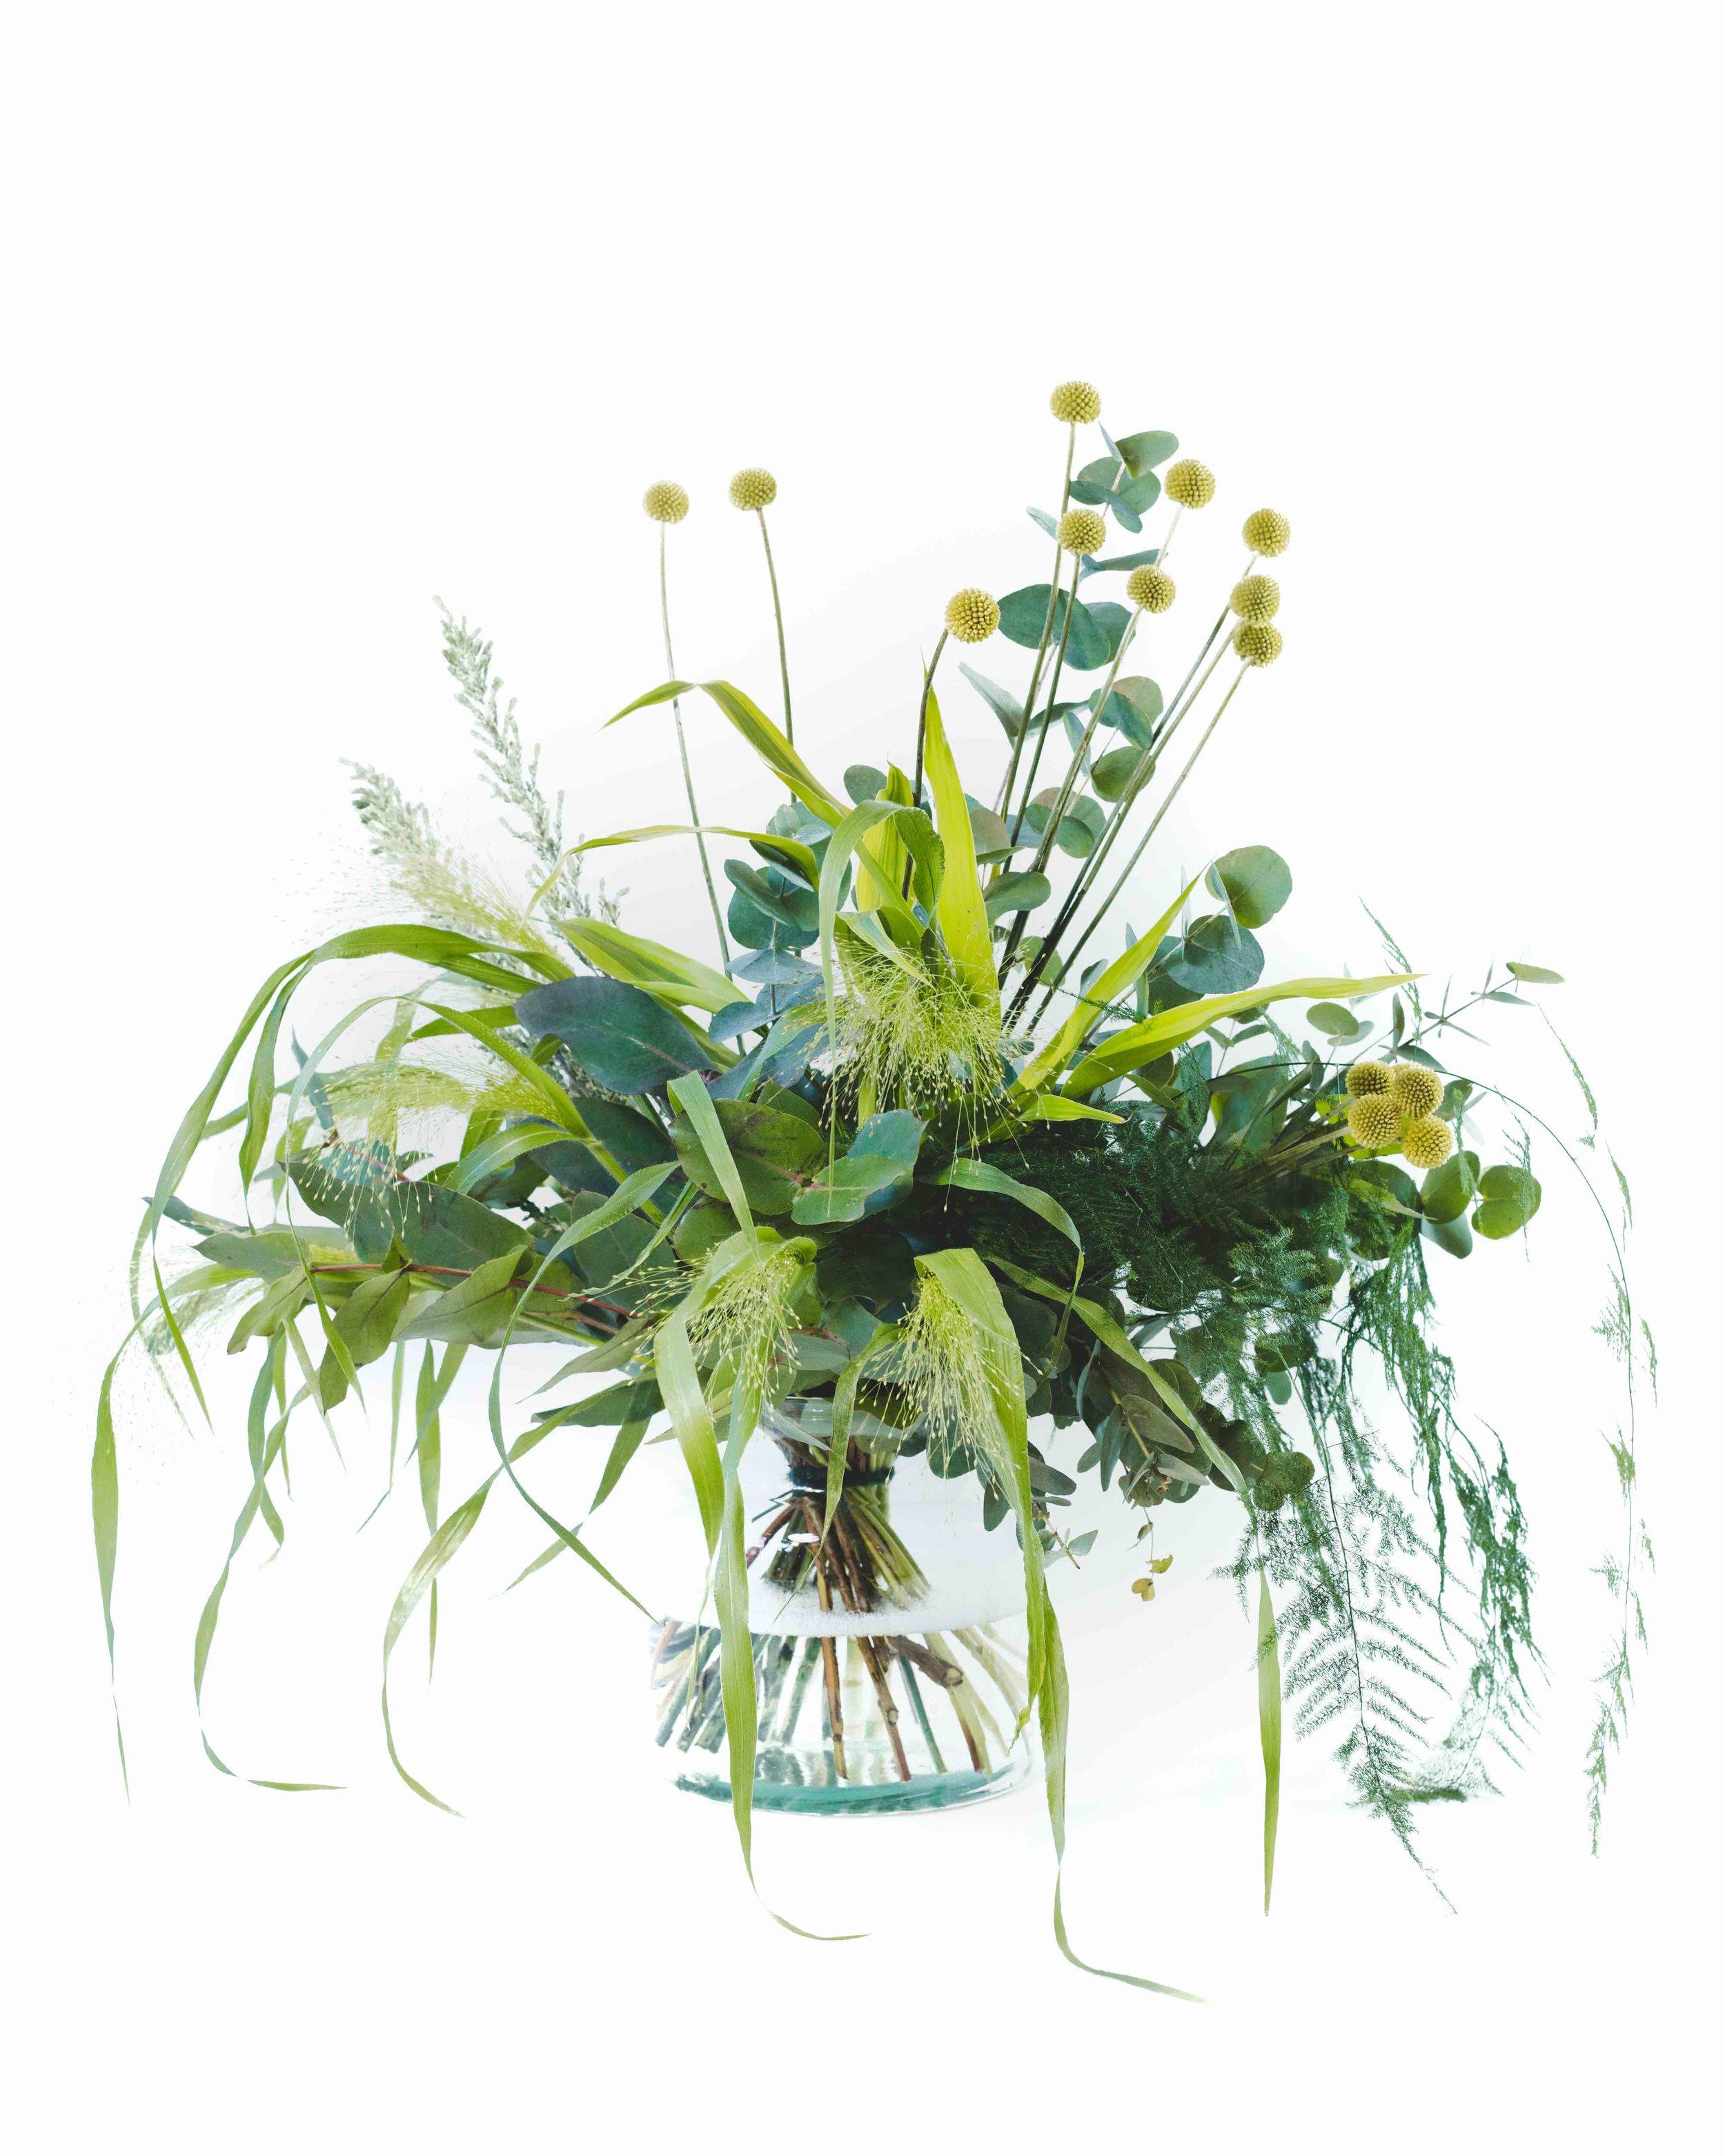 Flowers at Lansdowne Florist